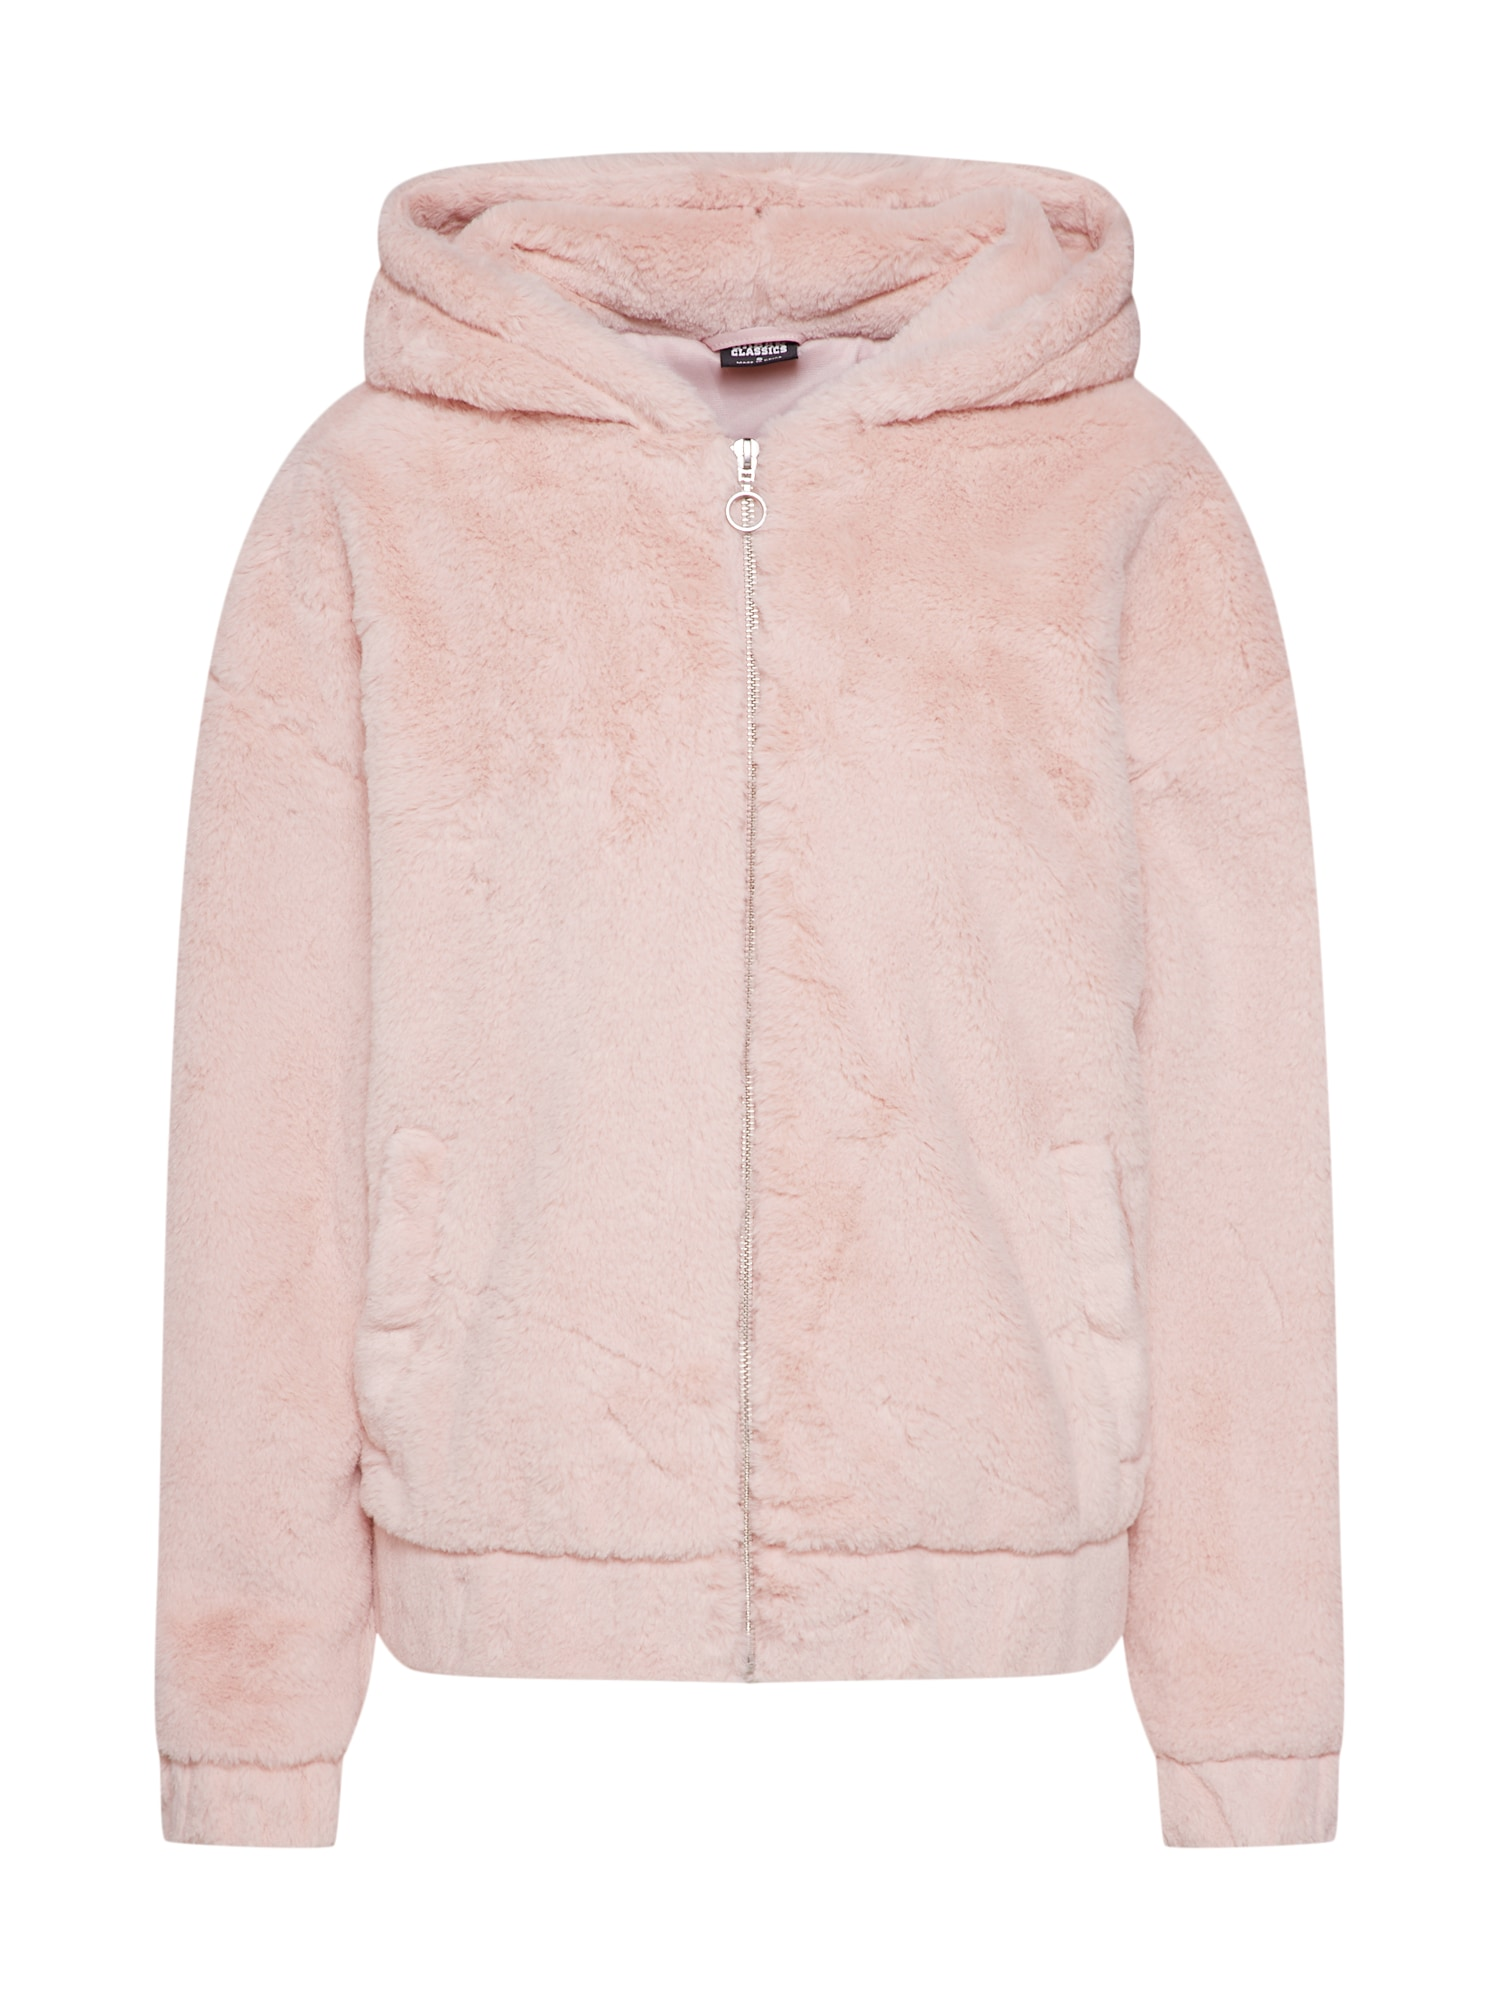 Mikina s kapucí Ladies Teddy Jacket růžová Urban Classics